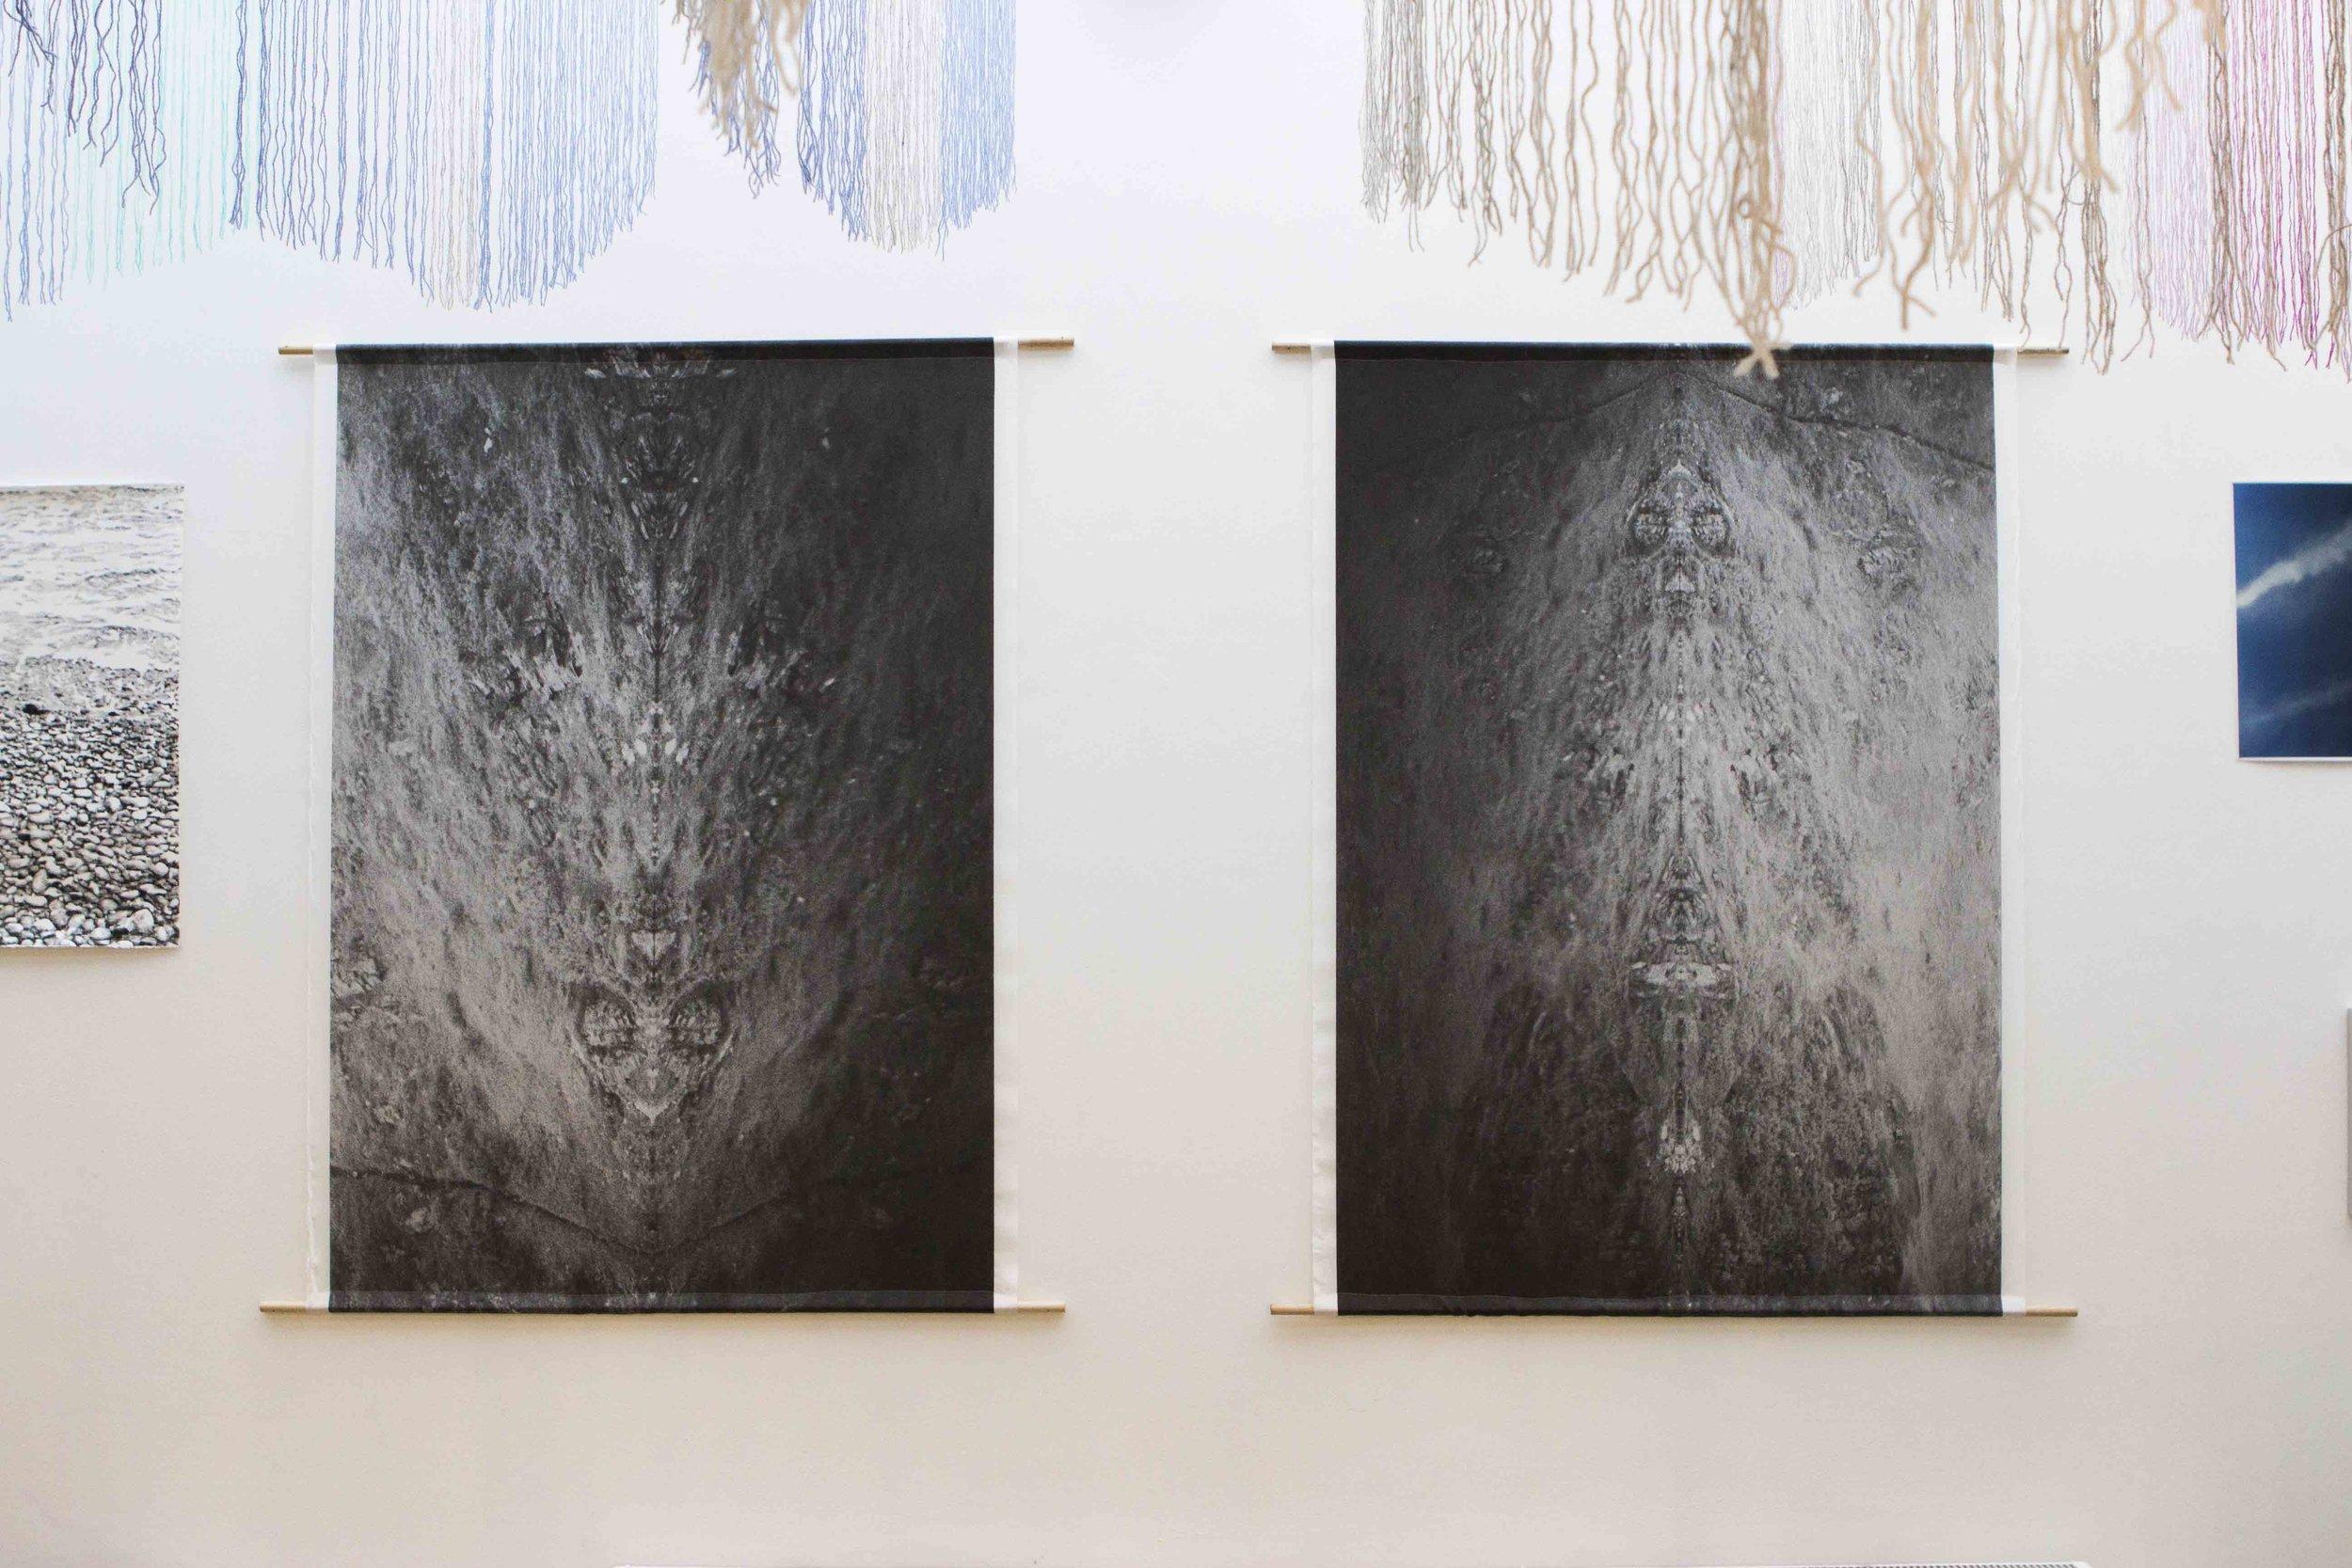 RESTLESS SIEDI, Olivia Kathigitis,  2018. photo prints on silk.  Arctic 70ºN